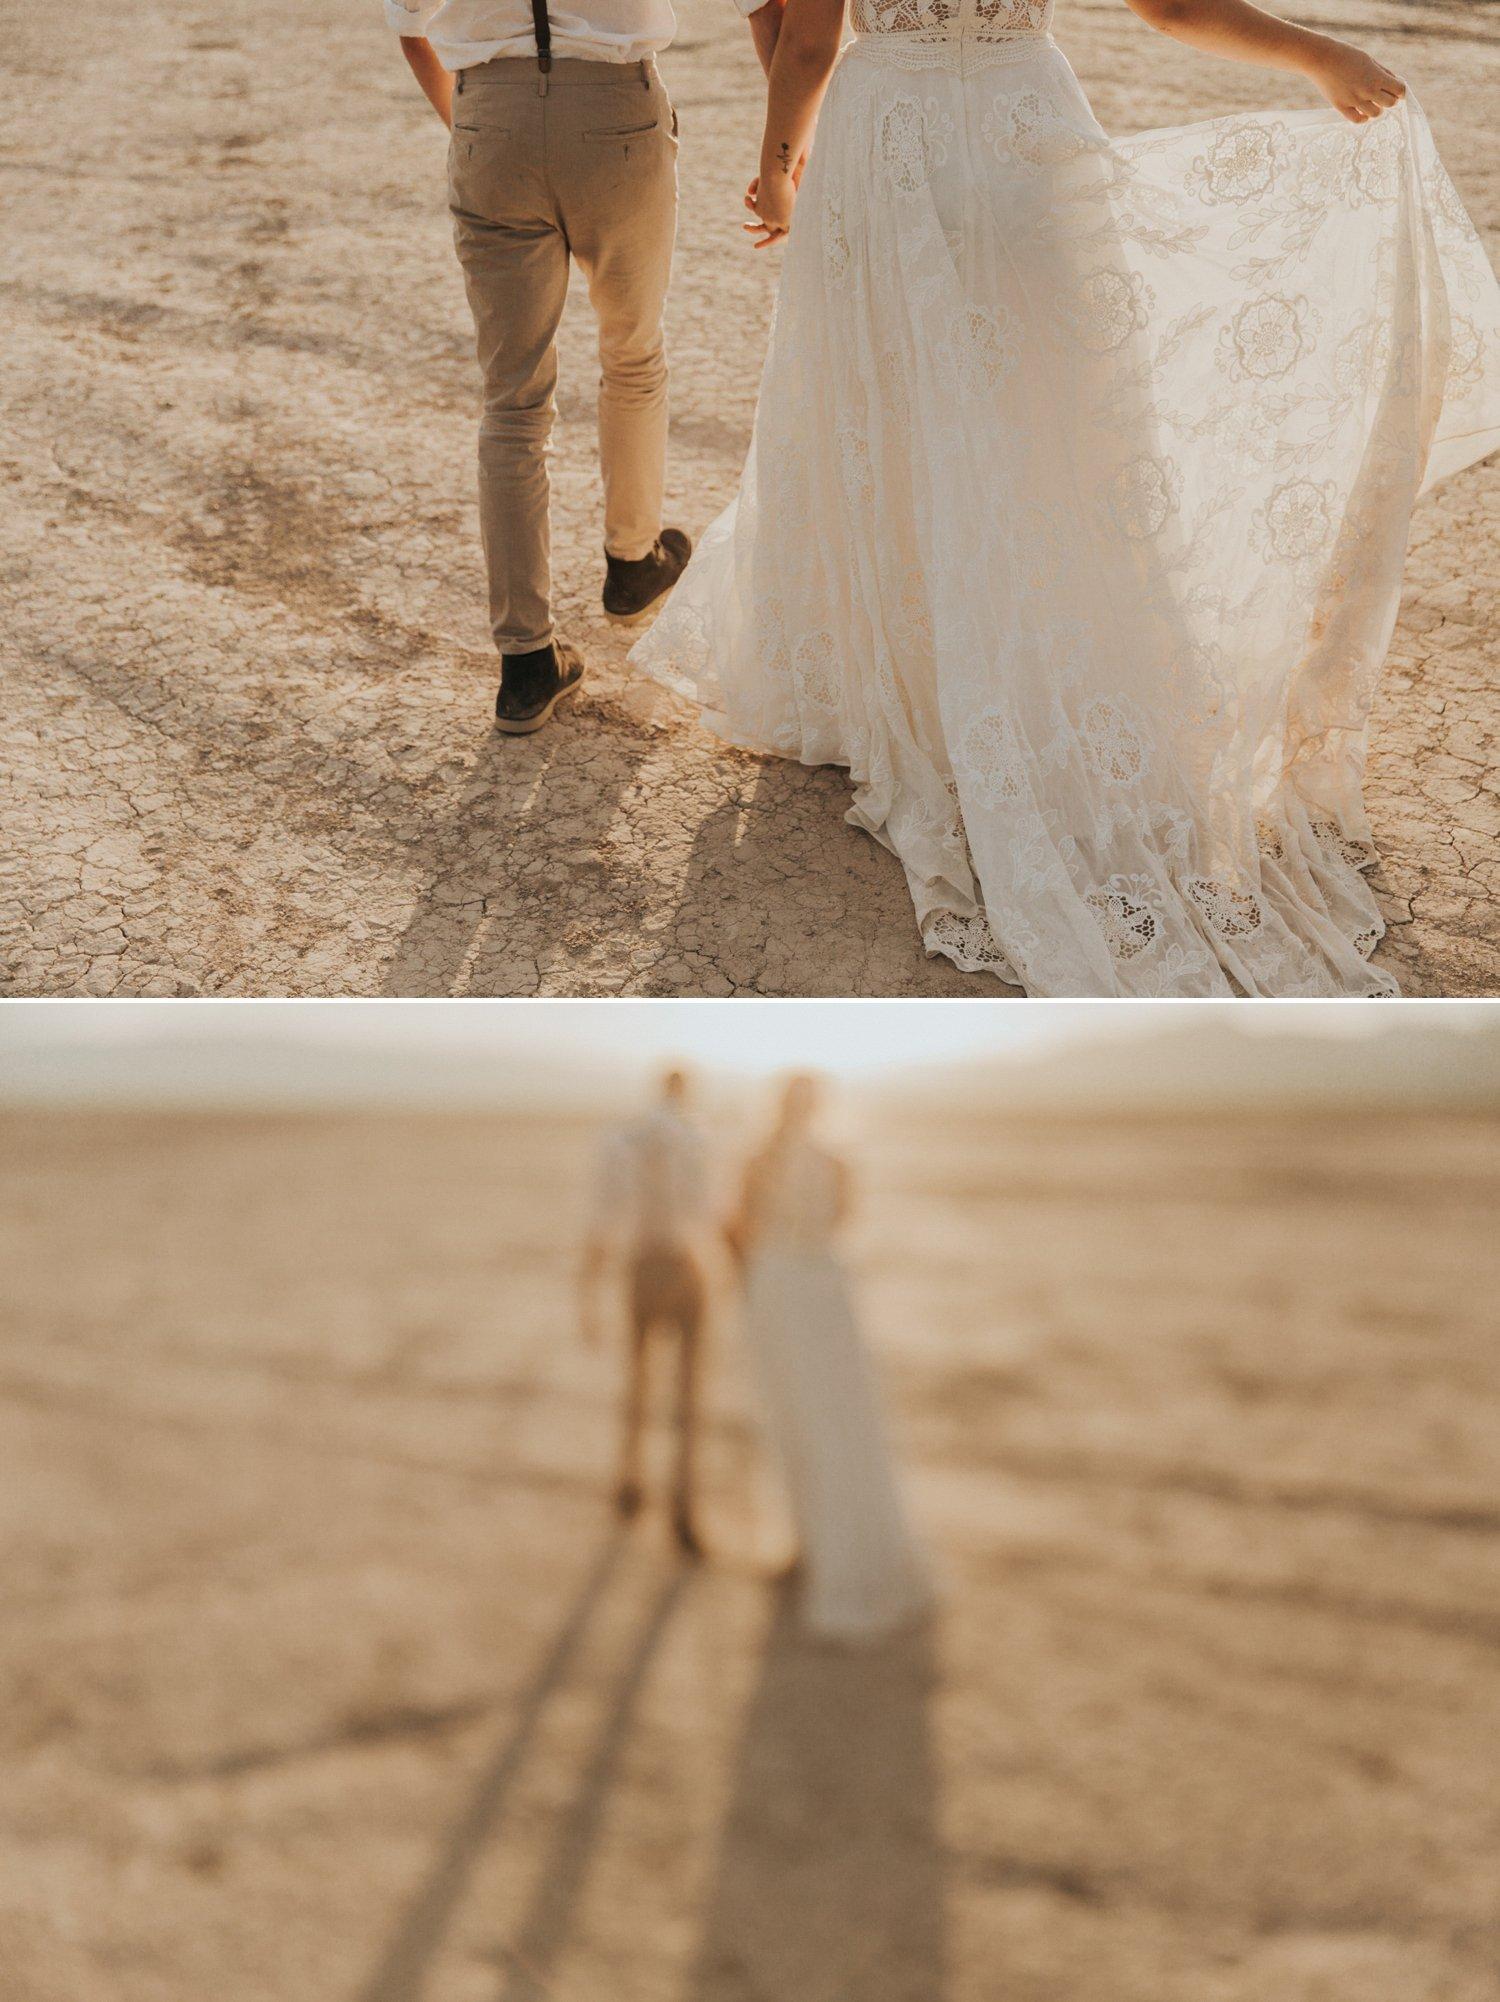 Las Vegas Elopement Dry Lake Bed